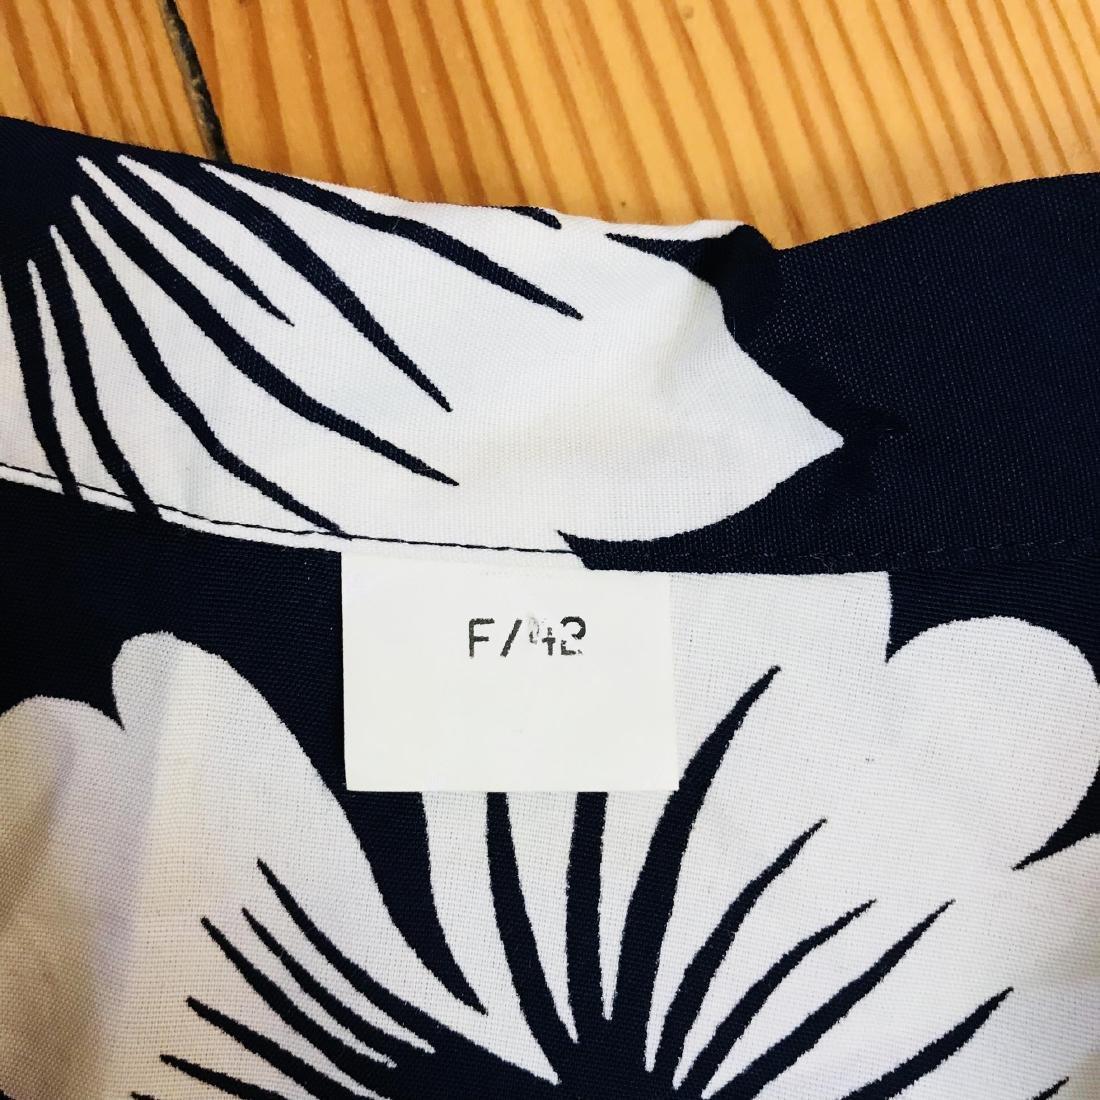 Vintage Women's Navy Blue Blouse Shirt Top - 5